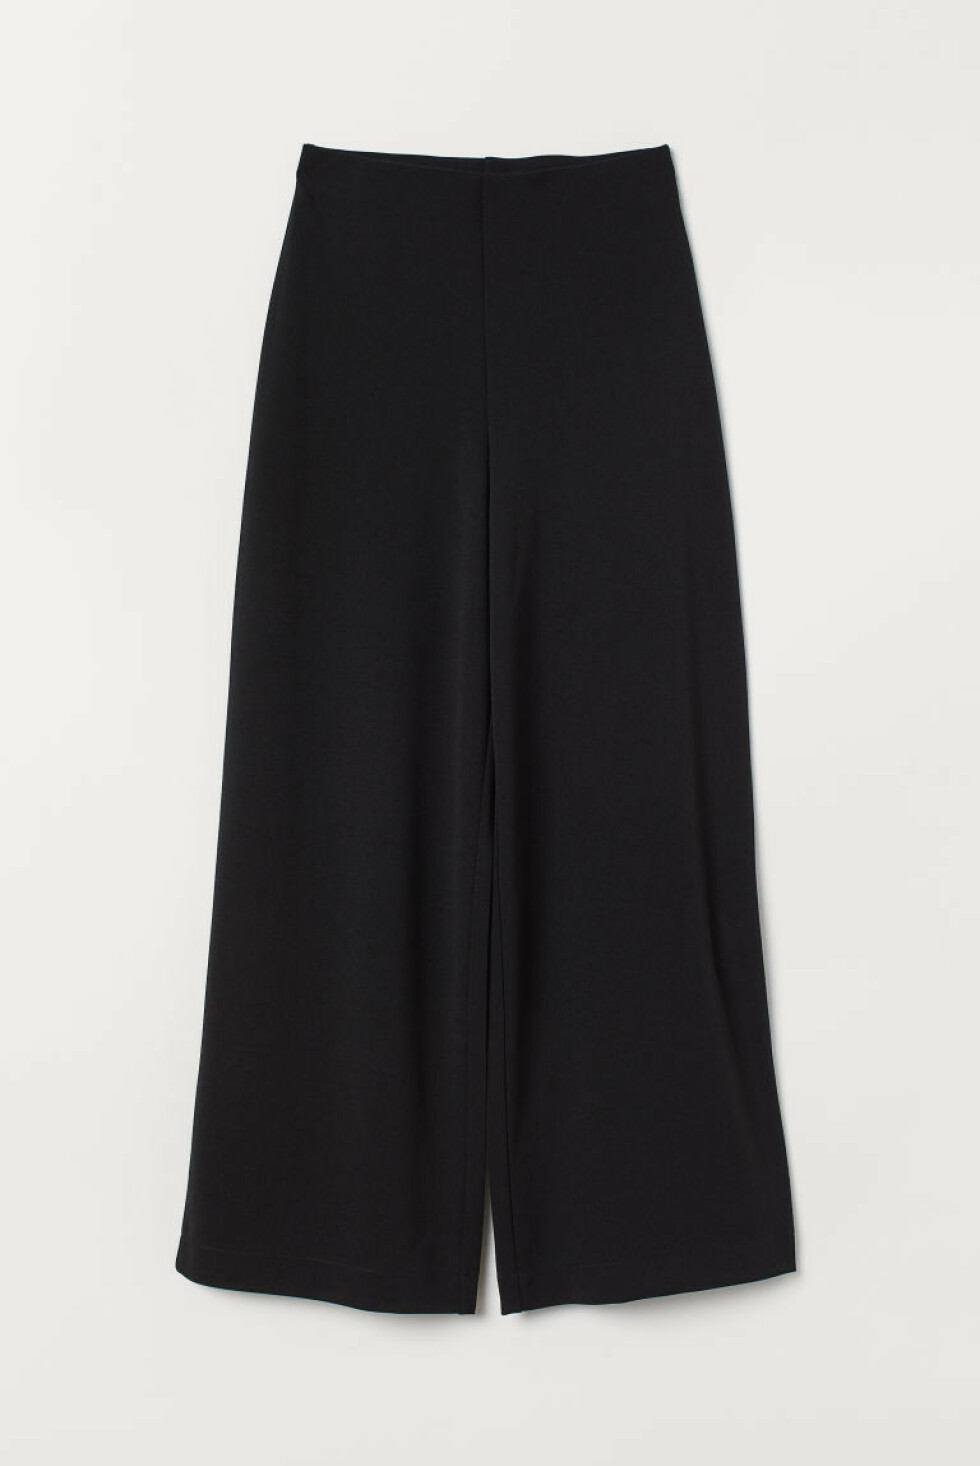 Bukse fra H&M |199,-| https://www2.hm.com/no_no/productpage.0744712001.html